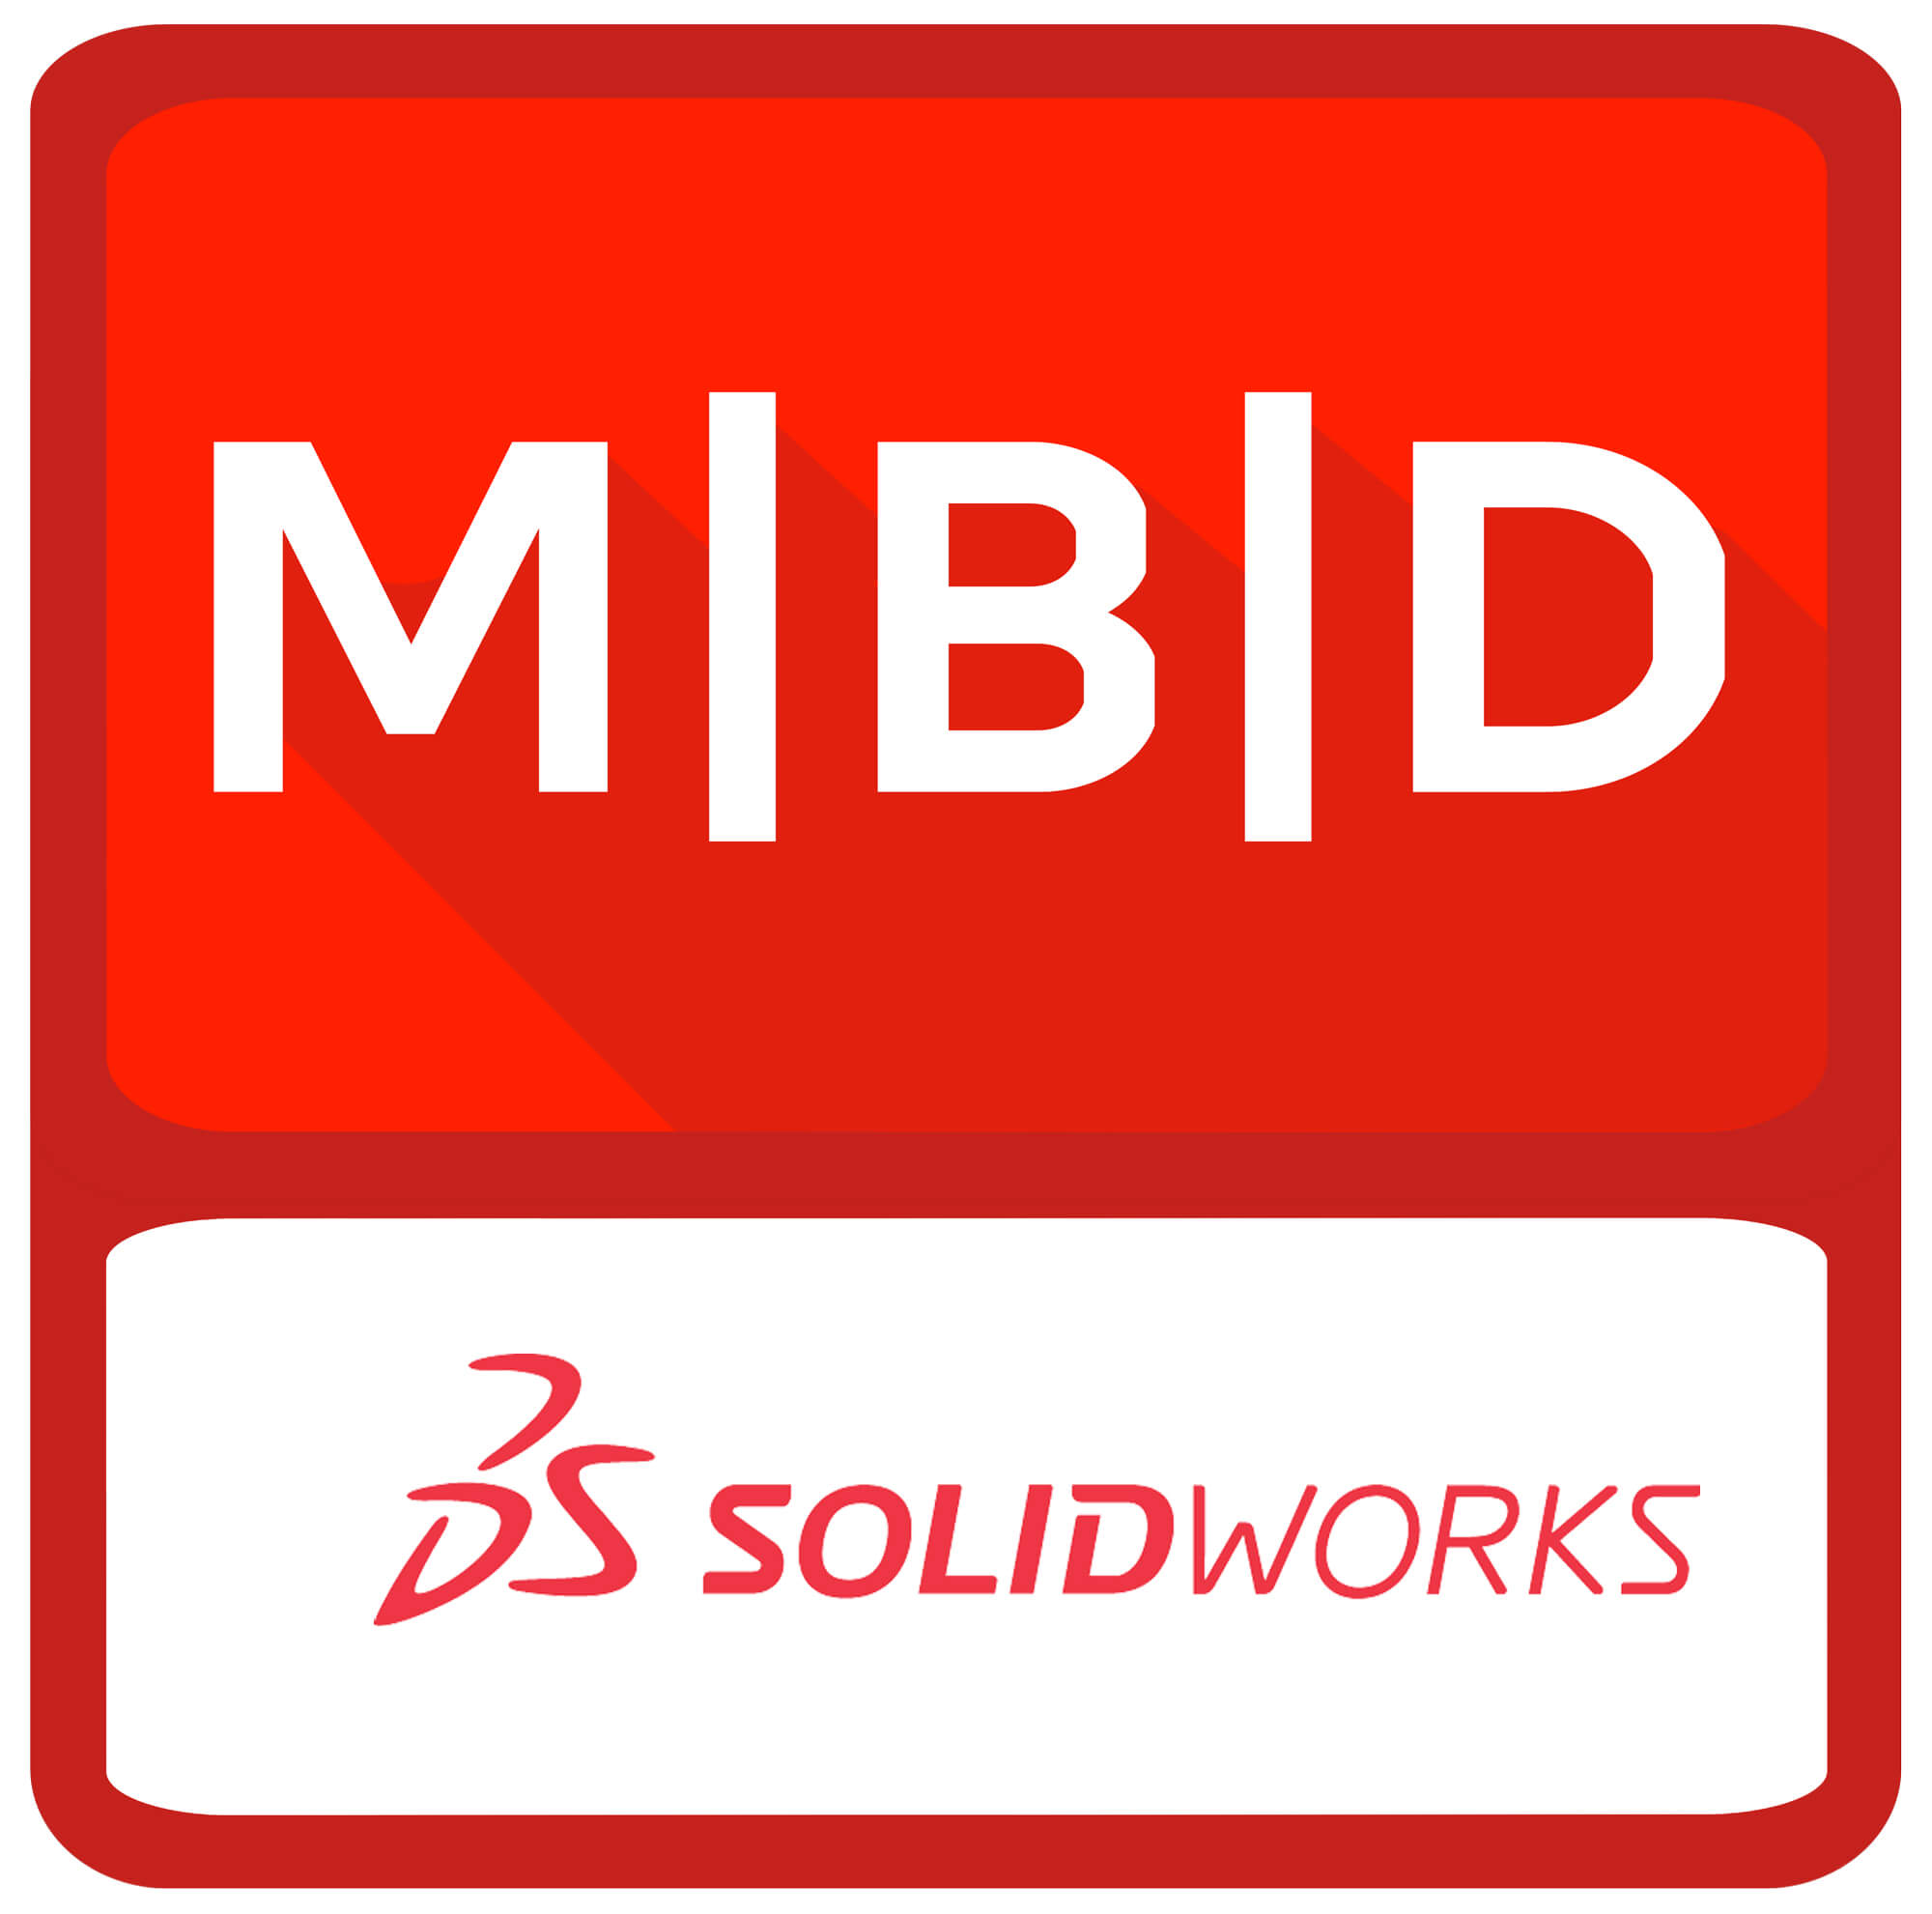 MBDVidia-solidworks-logo2